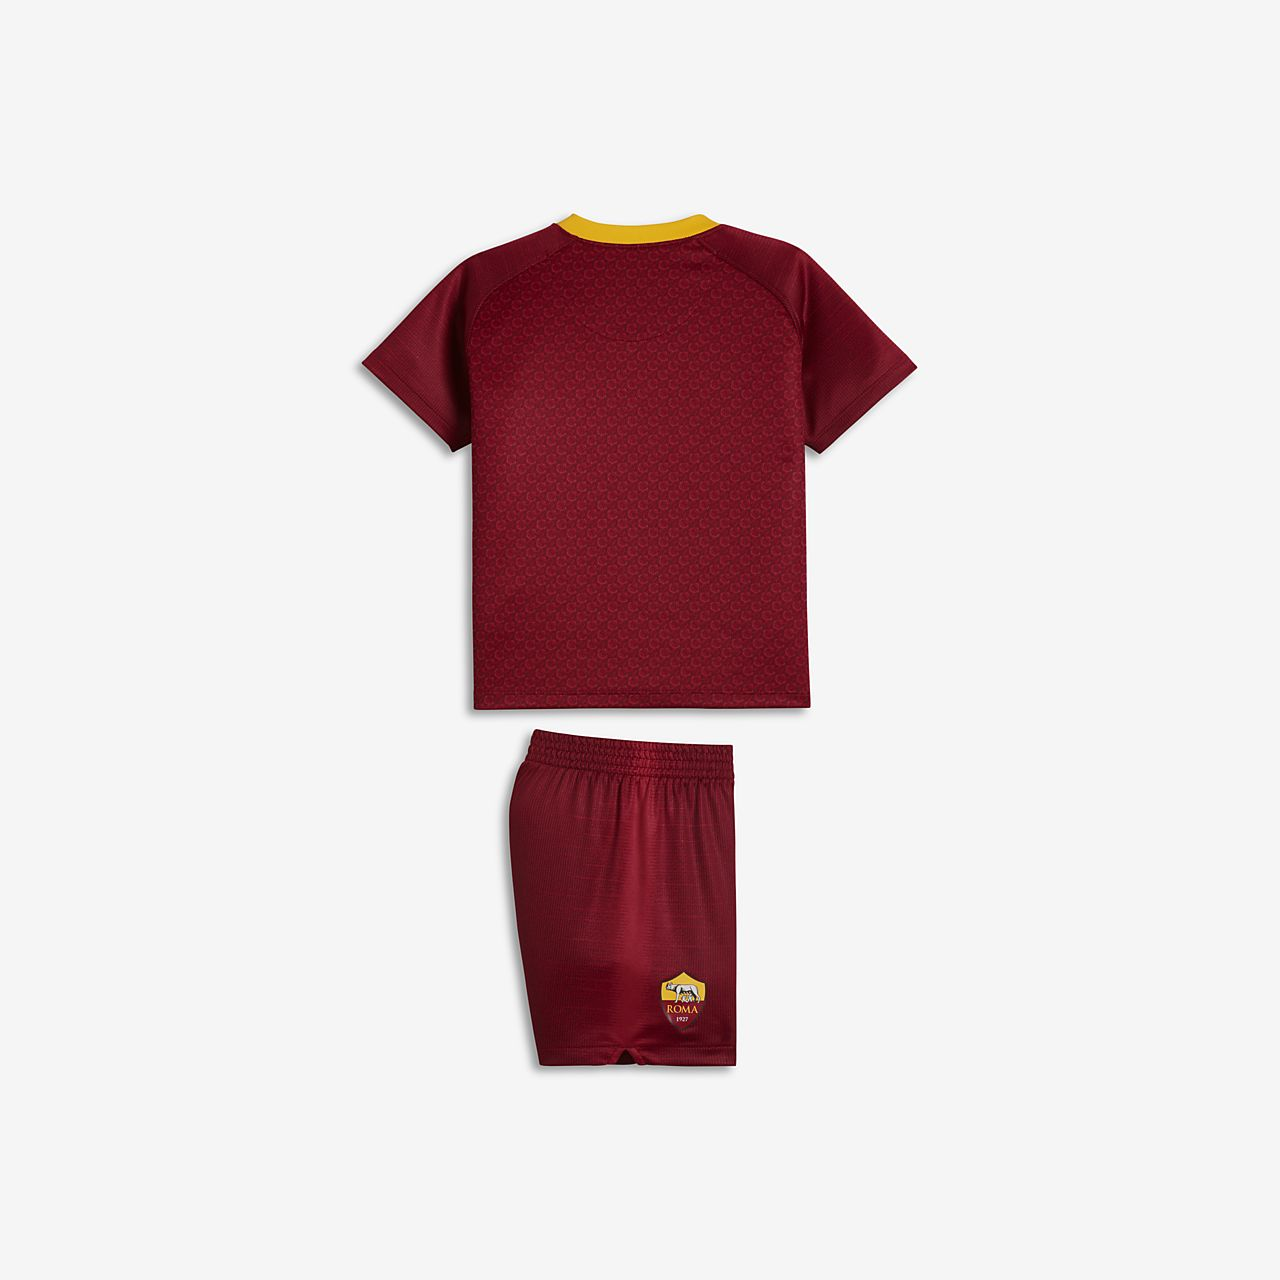 c568d5cd441 2018/19 A.S. Roma Stadium Home Baby Football Kit. Nike.com BE